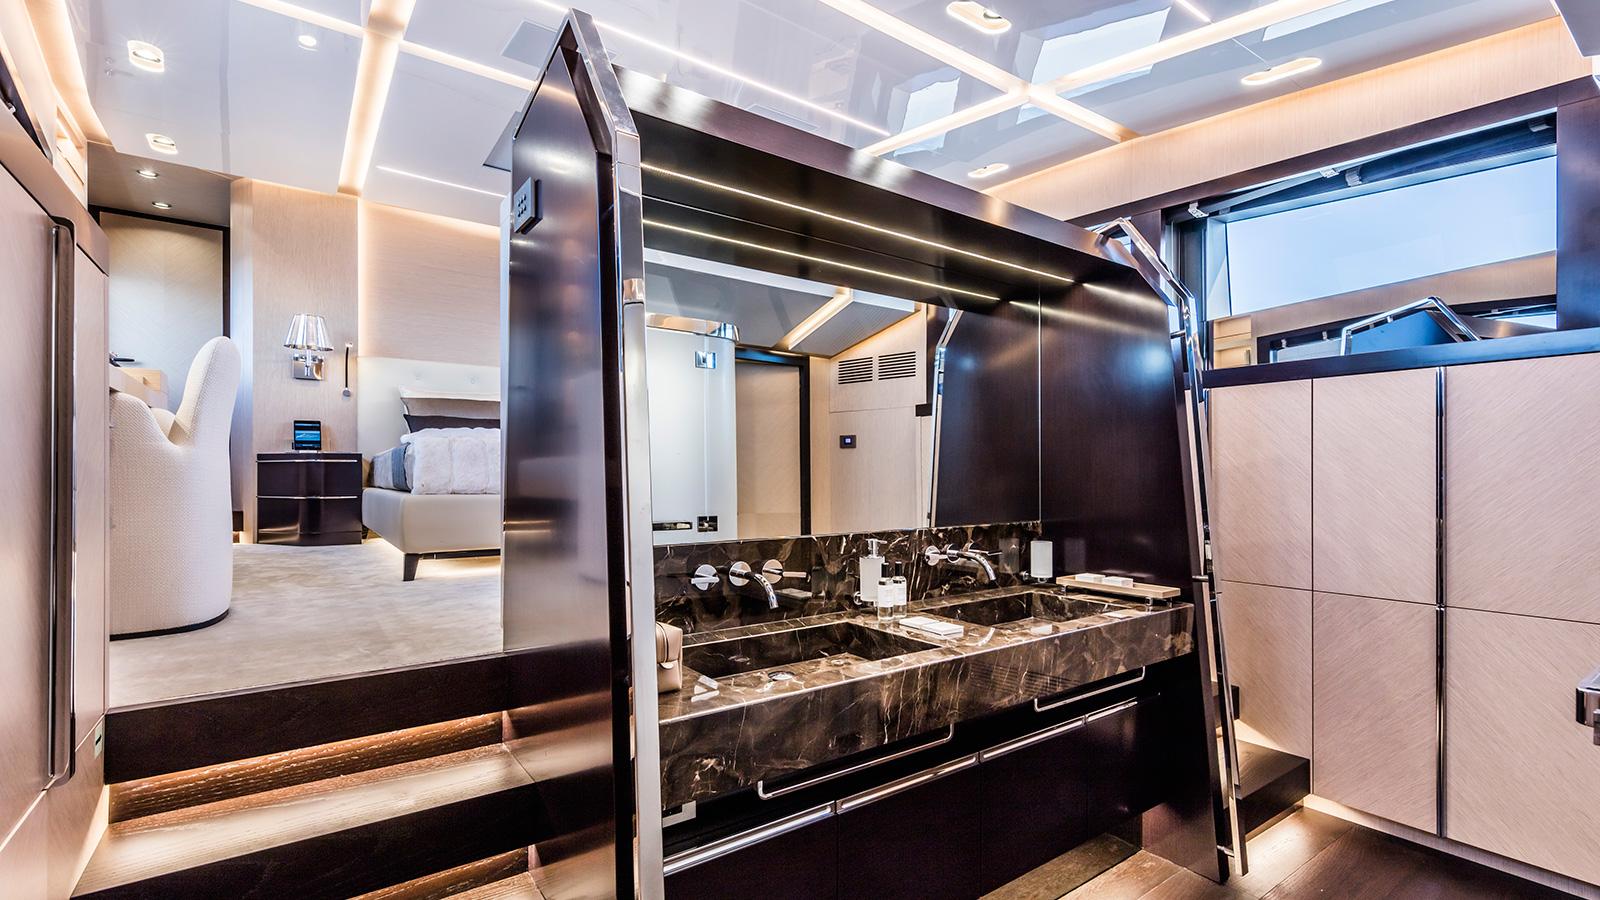 the-master-en-suite-of-the-isa-120-yacht-clorinda